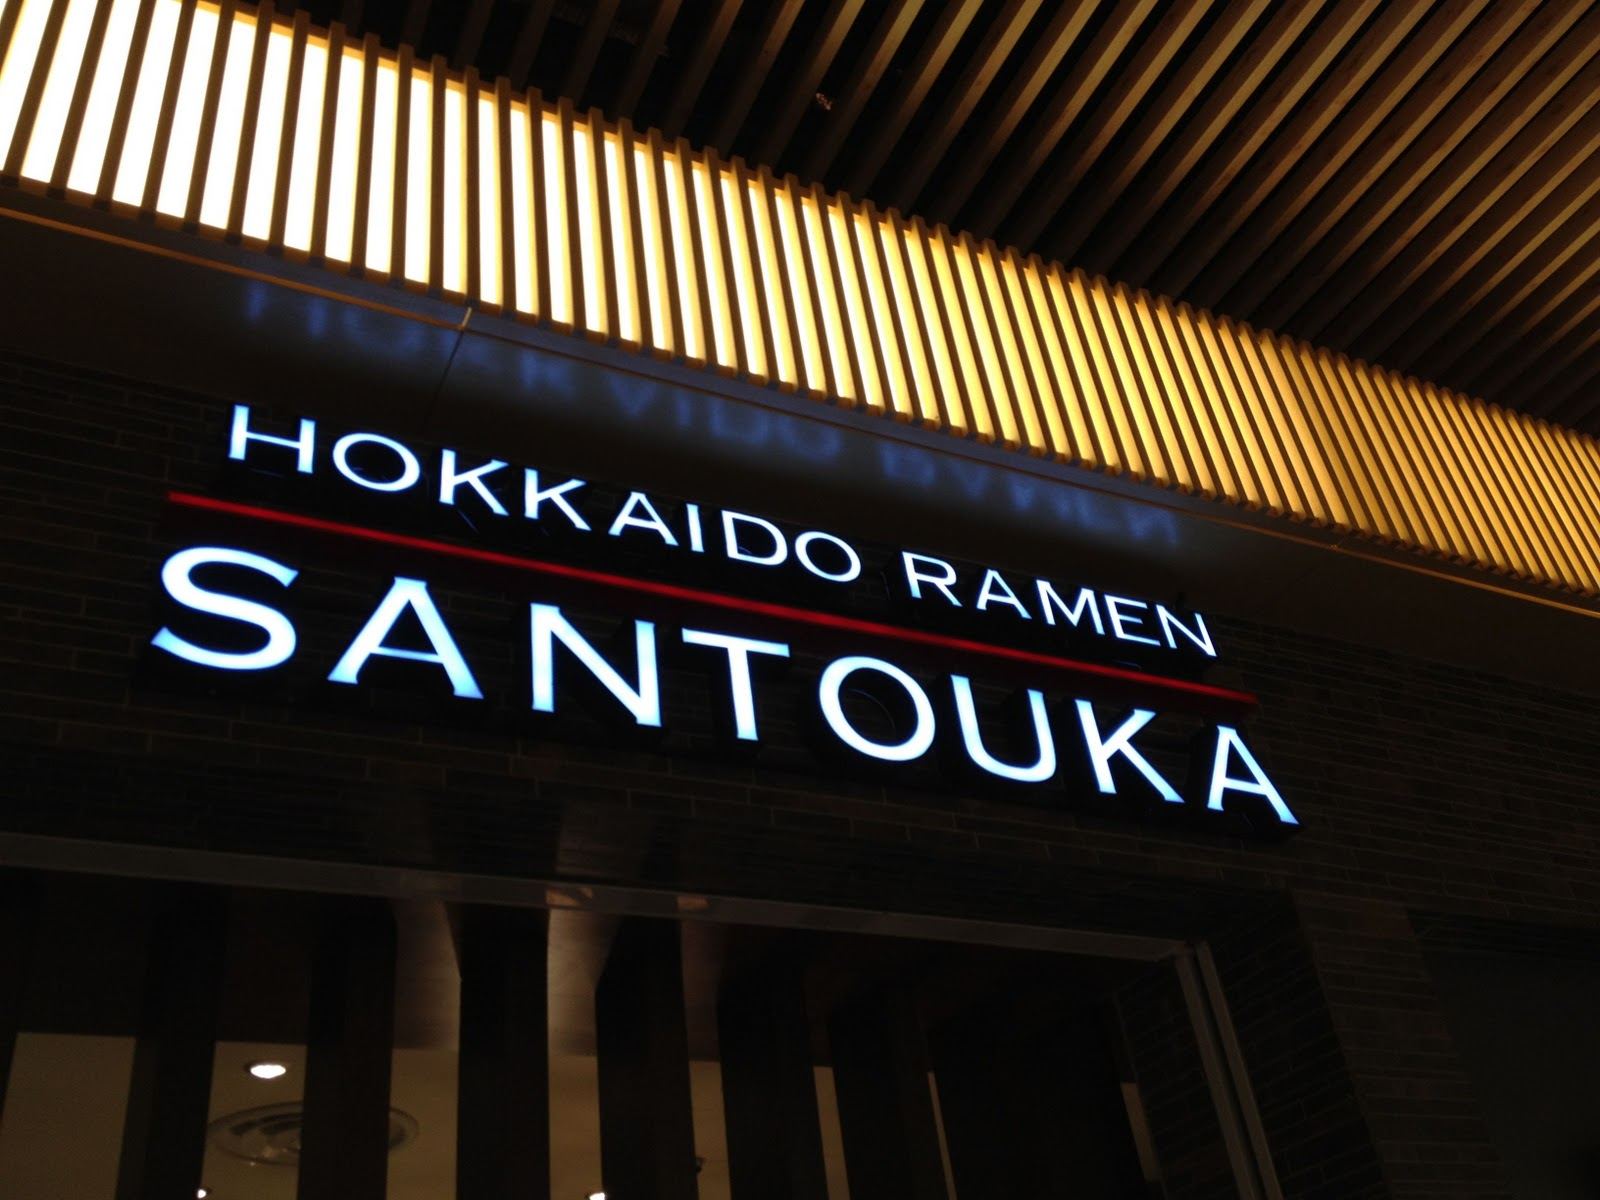 cheng lavie hokkaido ramen santouka tokyo street pavilion. Black Bedroom Furniture Sets. Home Design Ideas